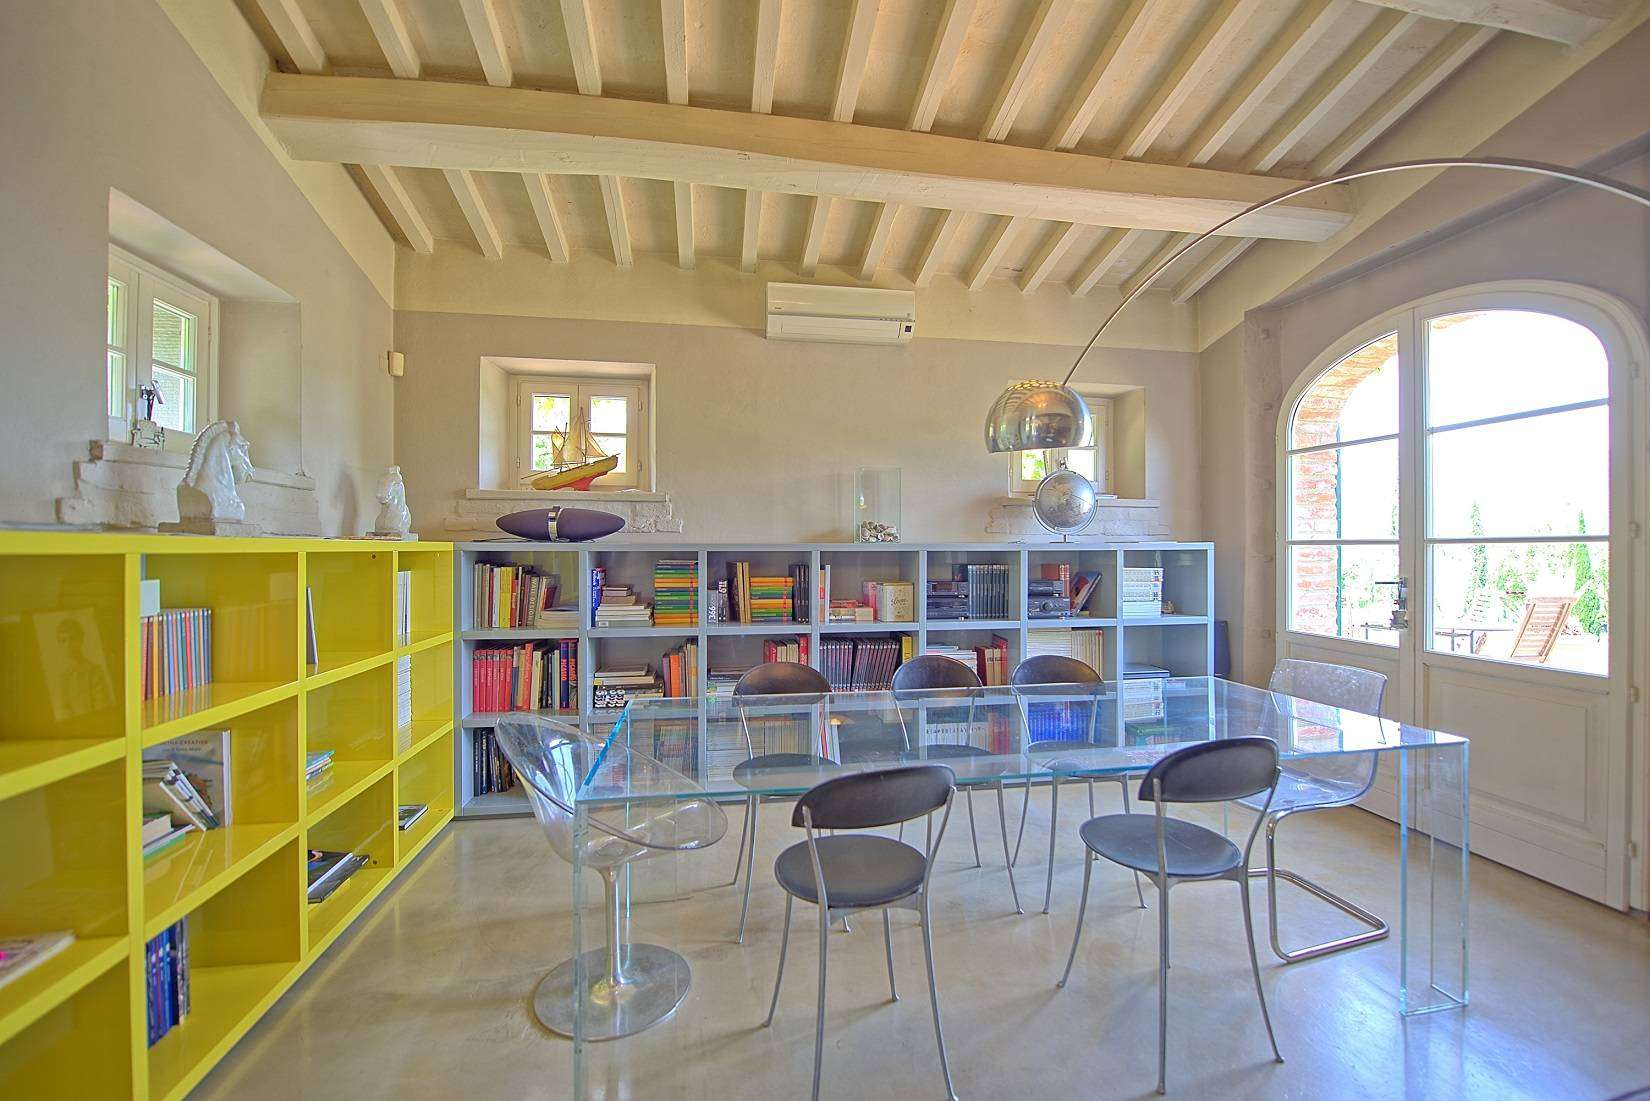 6 Jacopo Living room